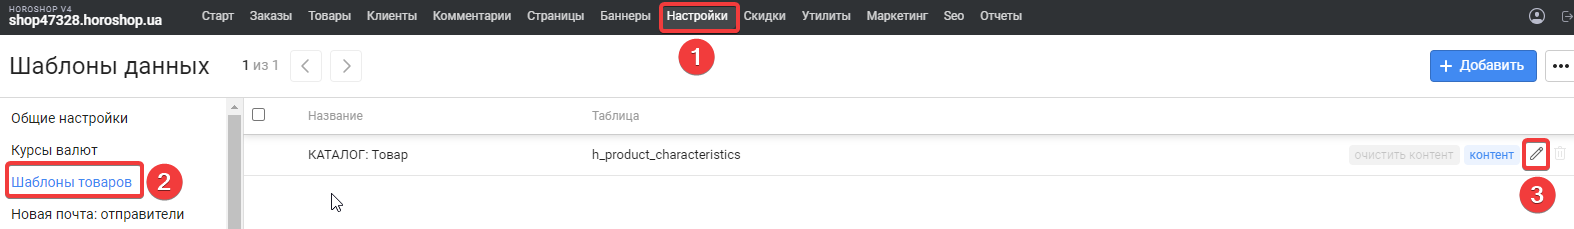 Редактирование Каталога